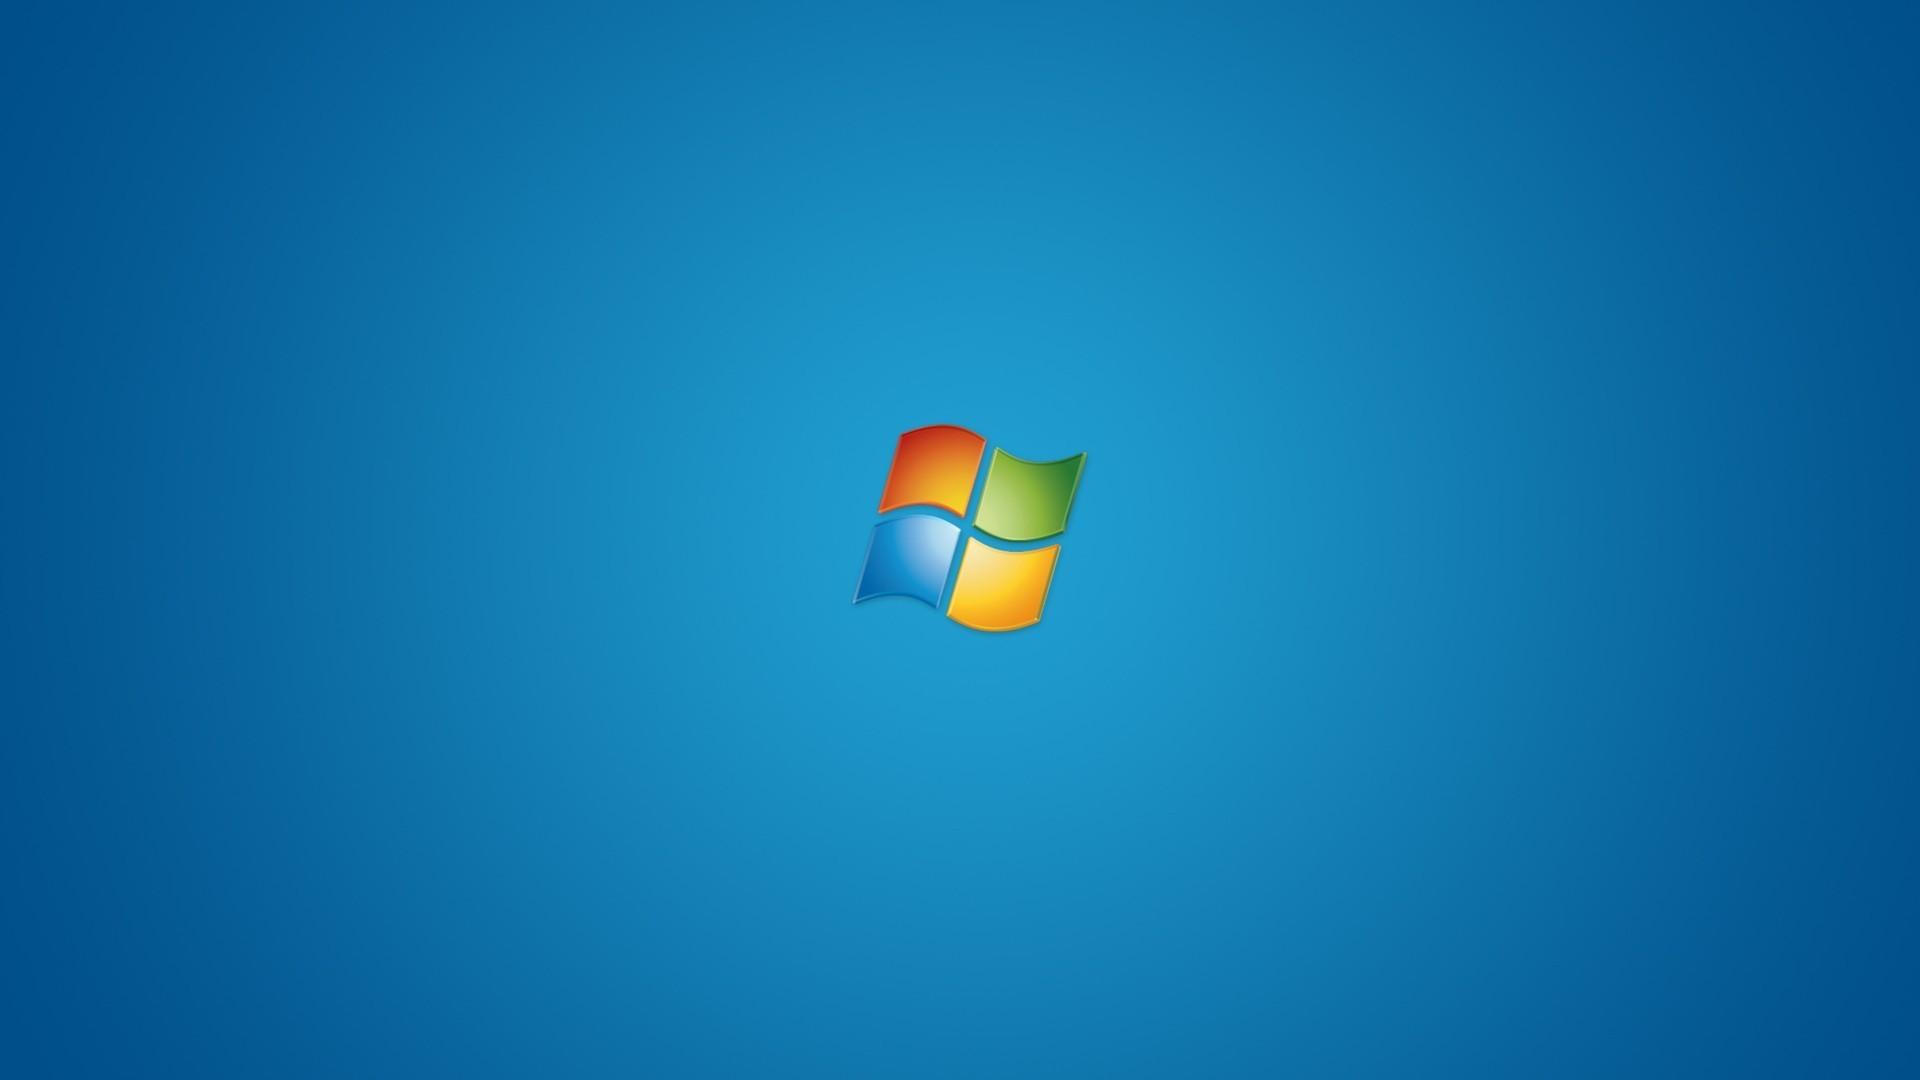 Res: 1920x1080, Window Wallpaper 22 - 1920 X 1080